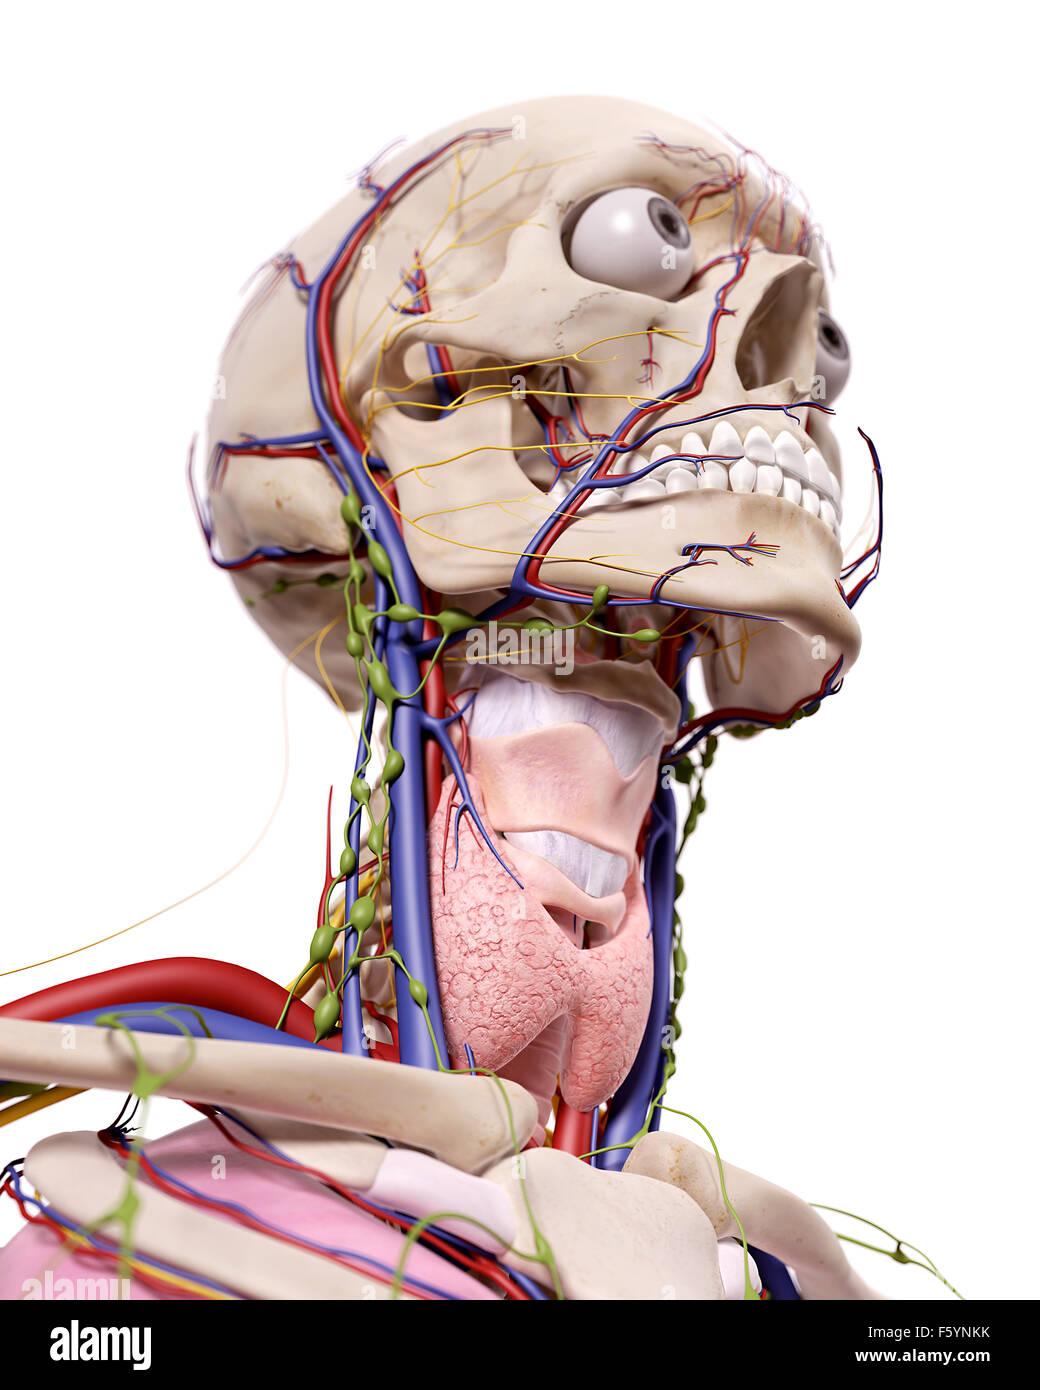 Human Skull Neck Larynx Illustration Stock Photos & Human Skull Neck ...